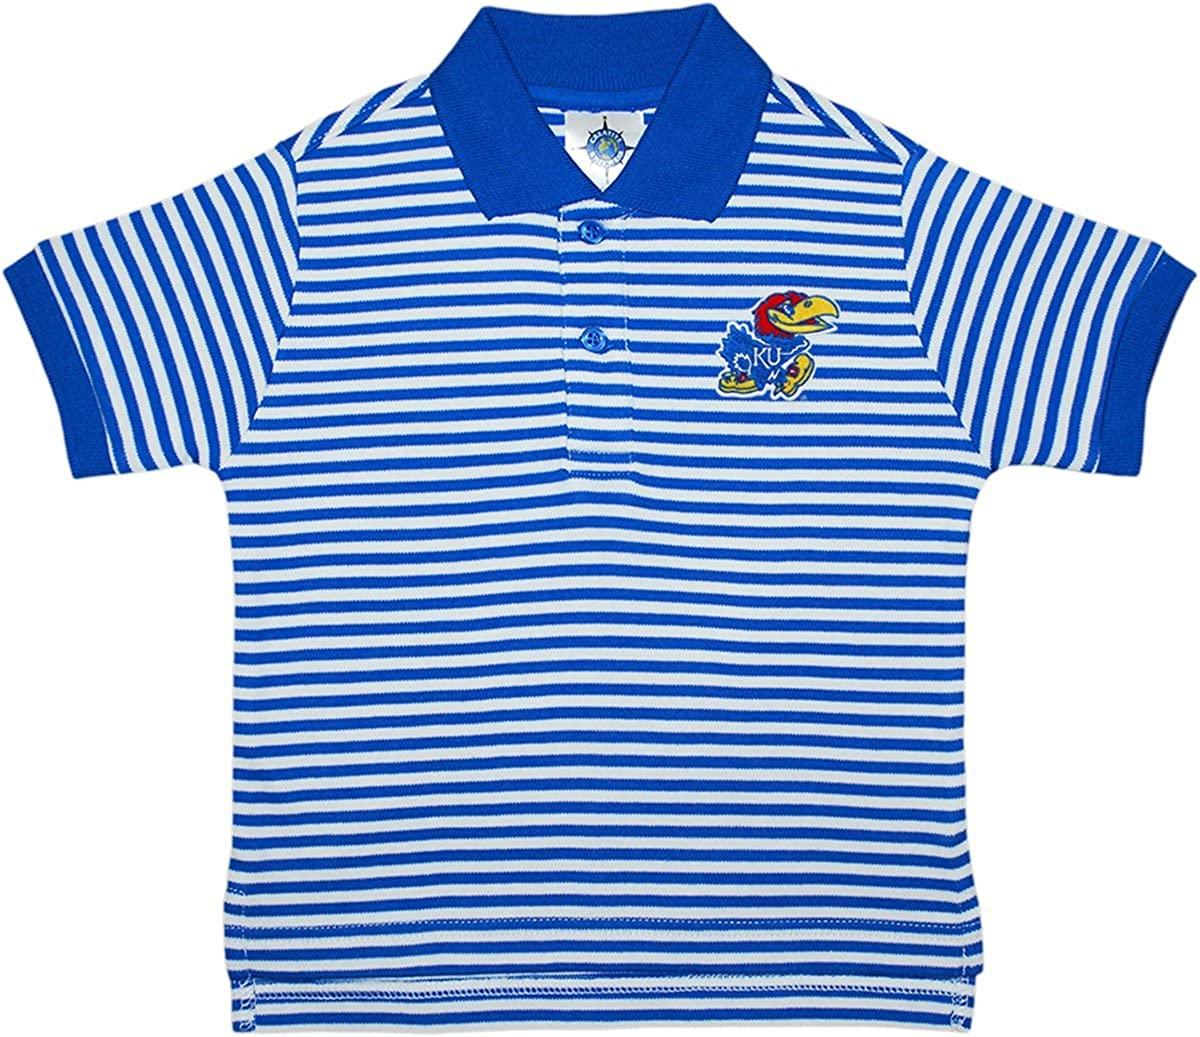 Creative Knitwear University of Kansas Jayhawks Striped Polo Shirt